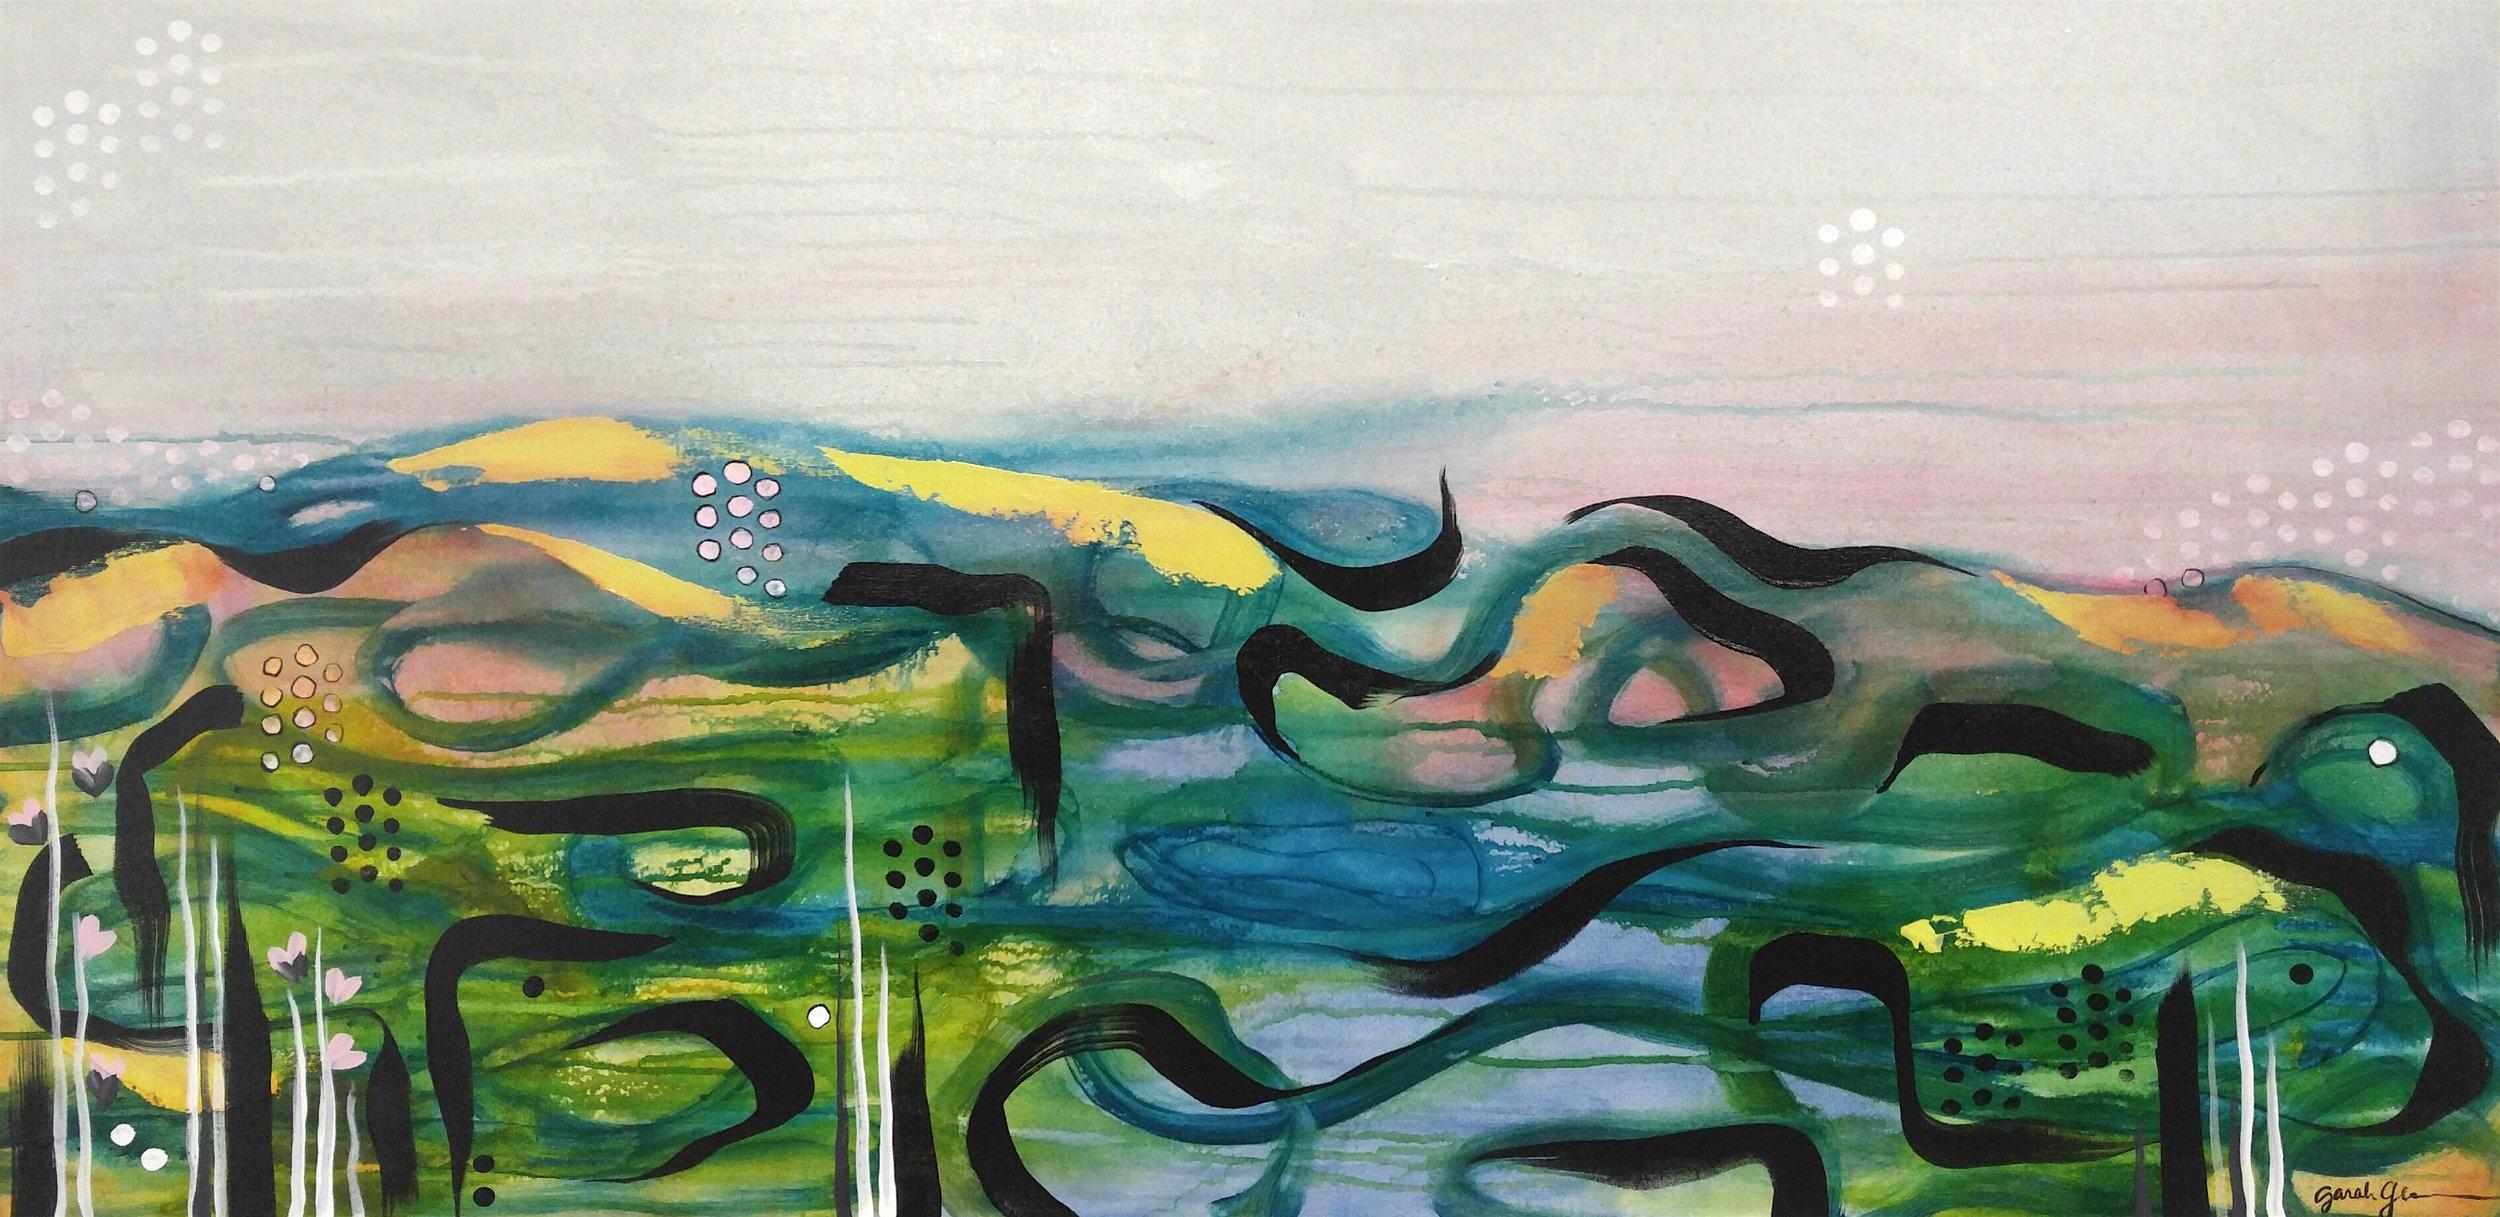 Her Earliest Stars  | 24 x 48 inch acrylic on canvas